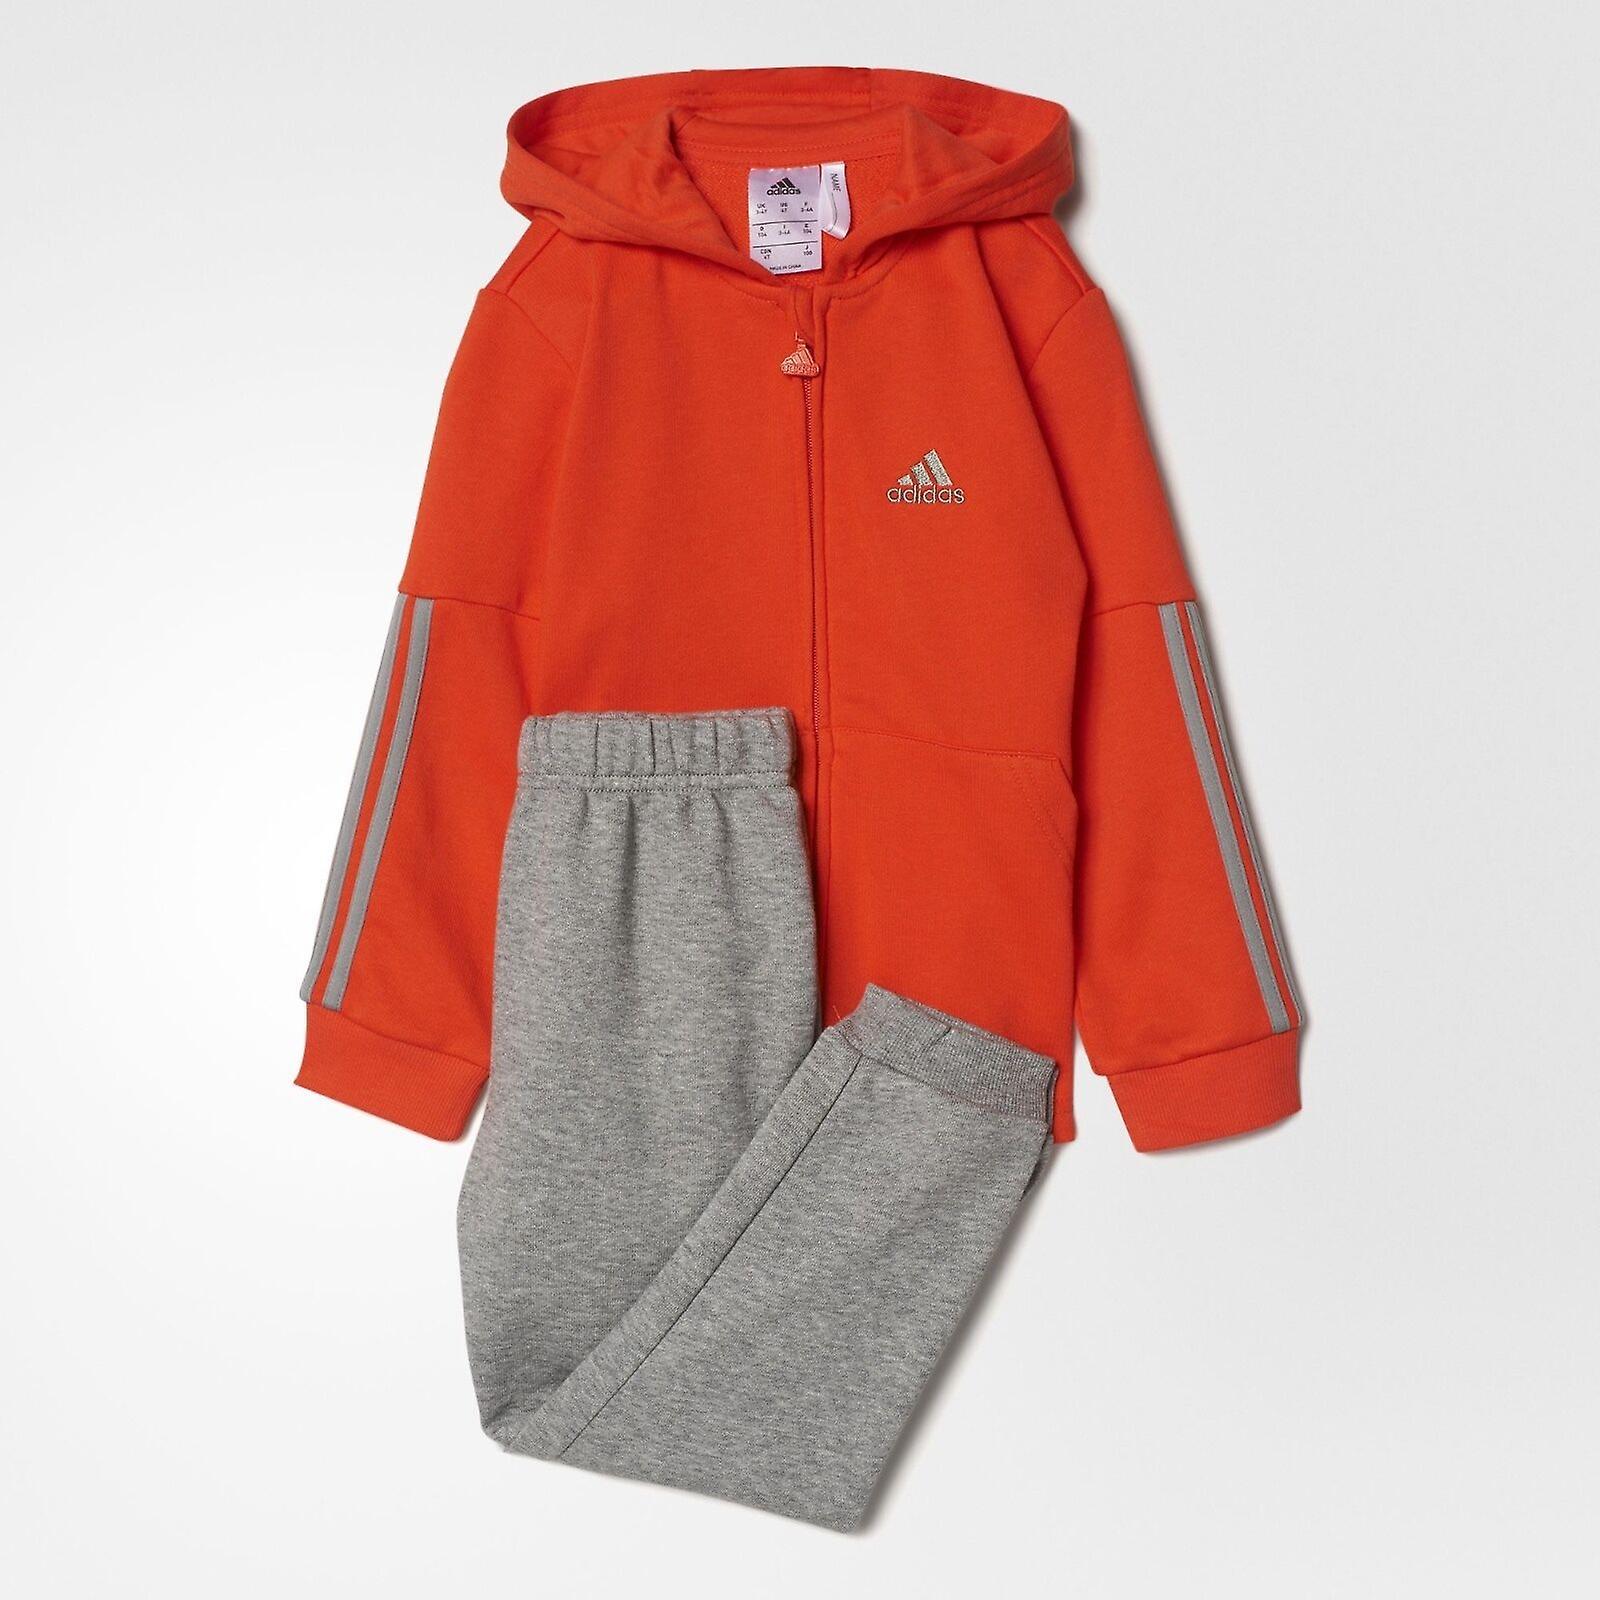 trainingsanzug adidas orange